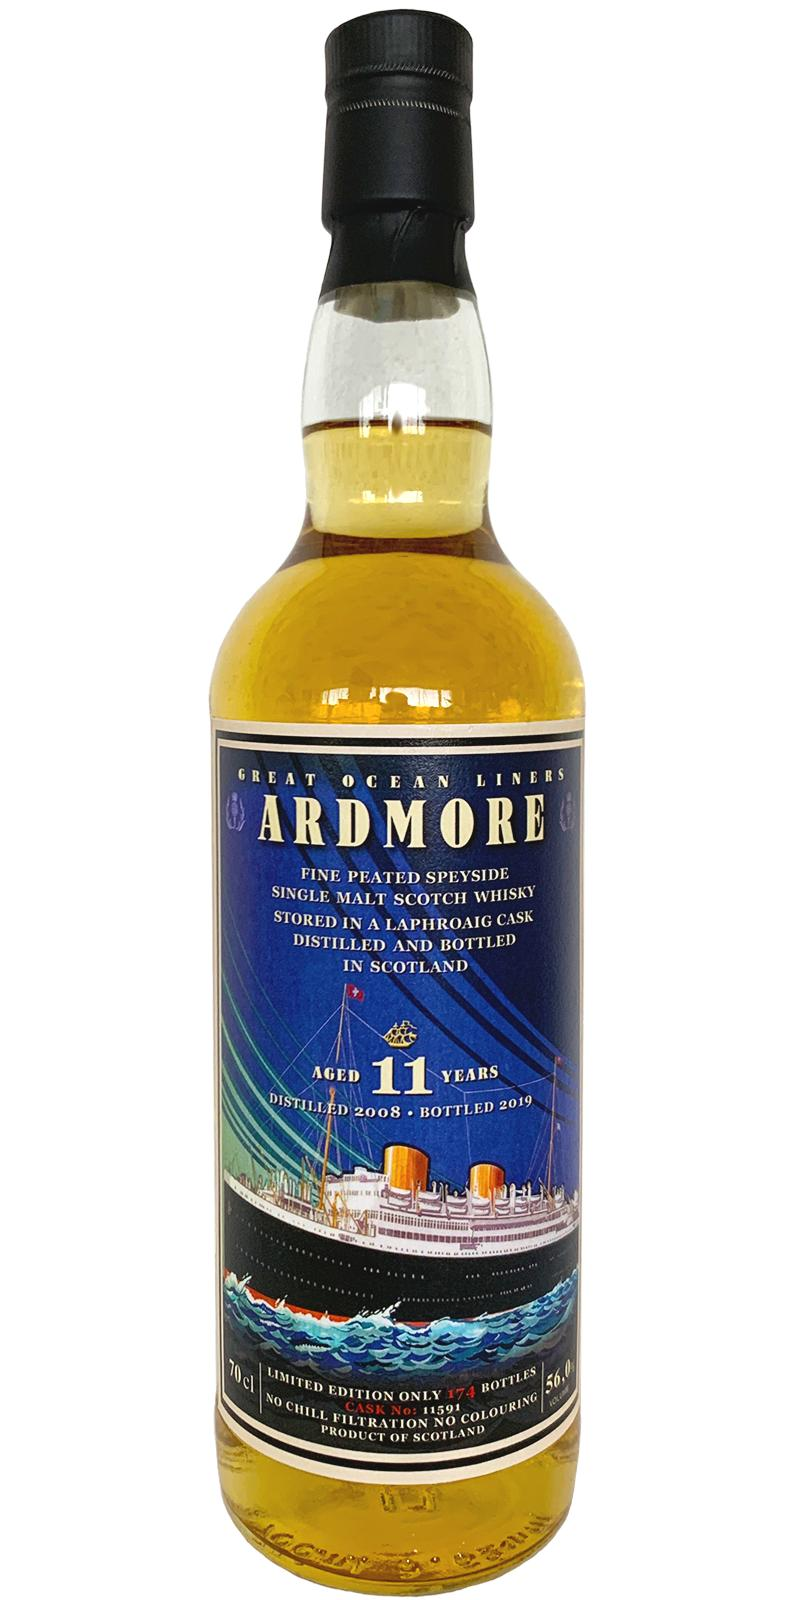 Ardmore 2008 JW